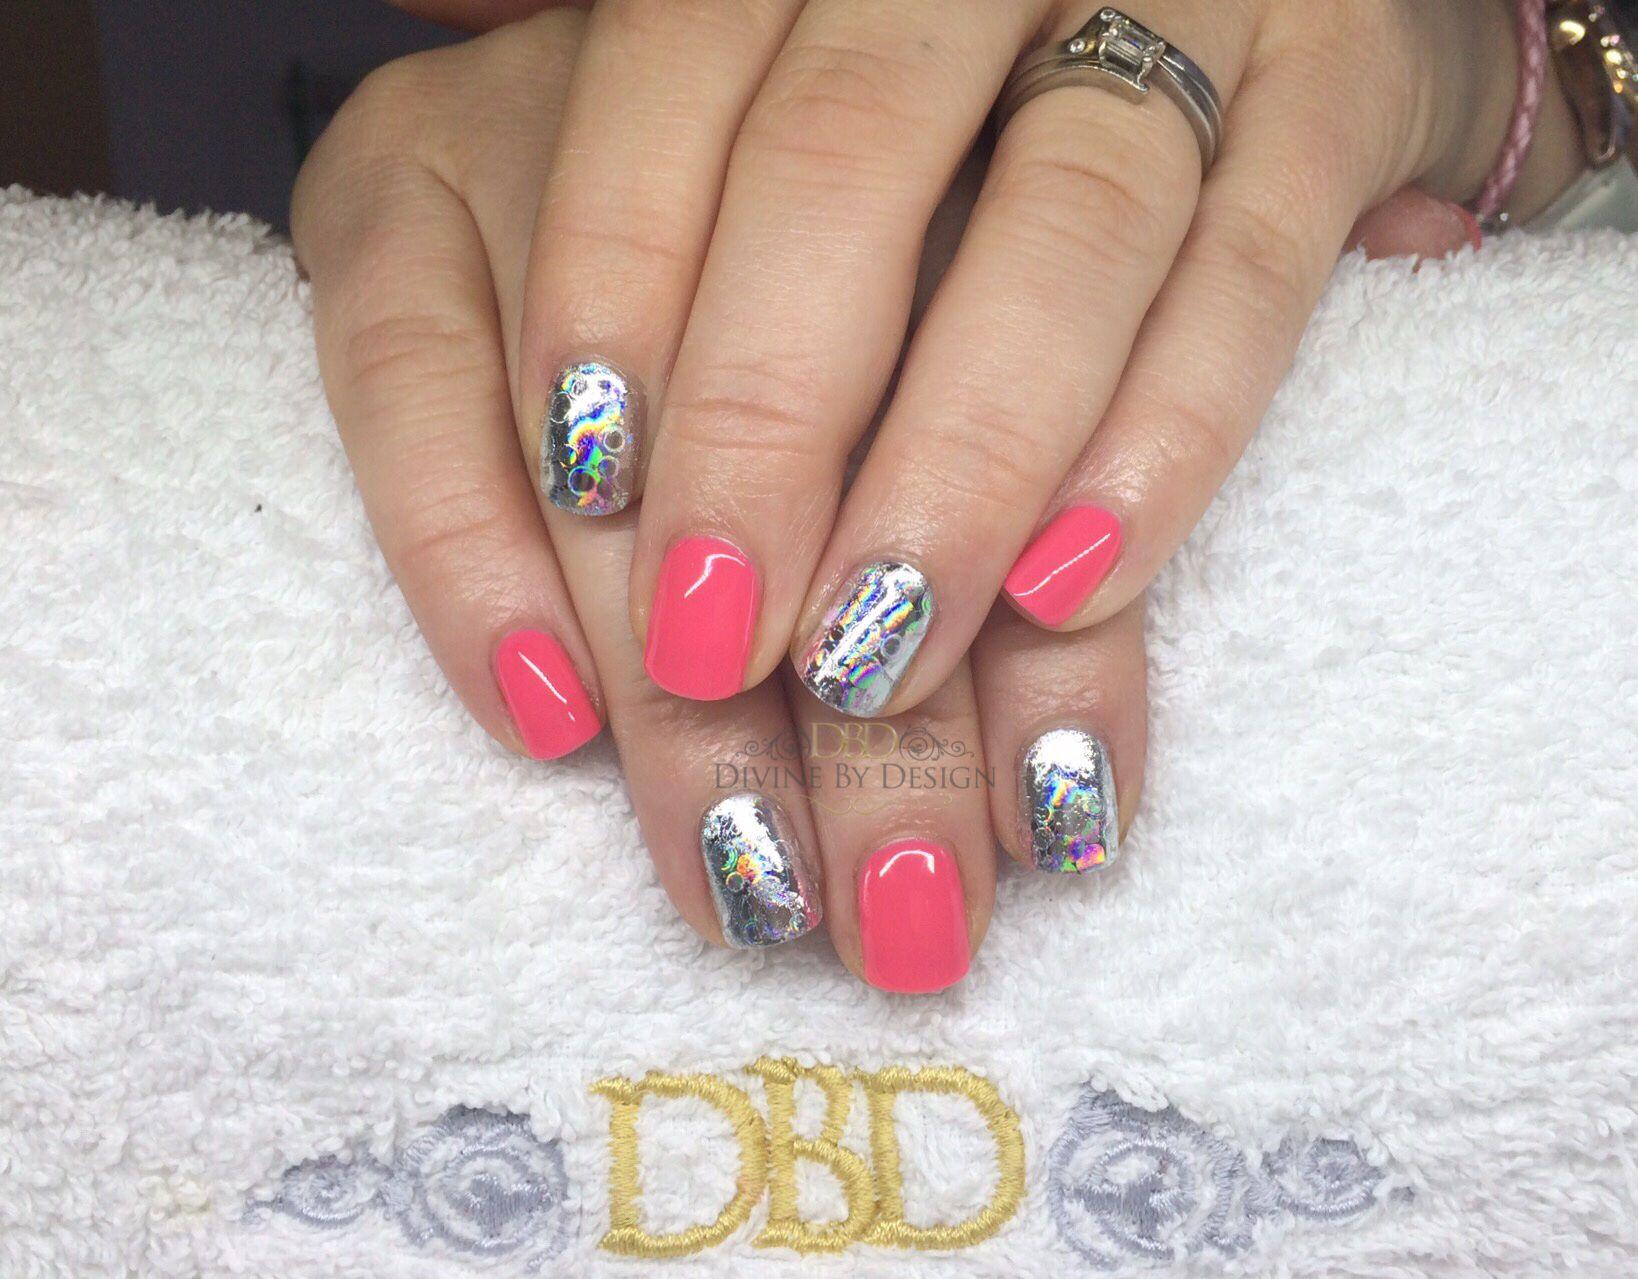 http://NatashaLee.info. Blogger. Gel II with foils